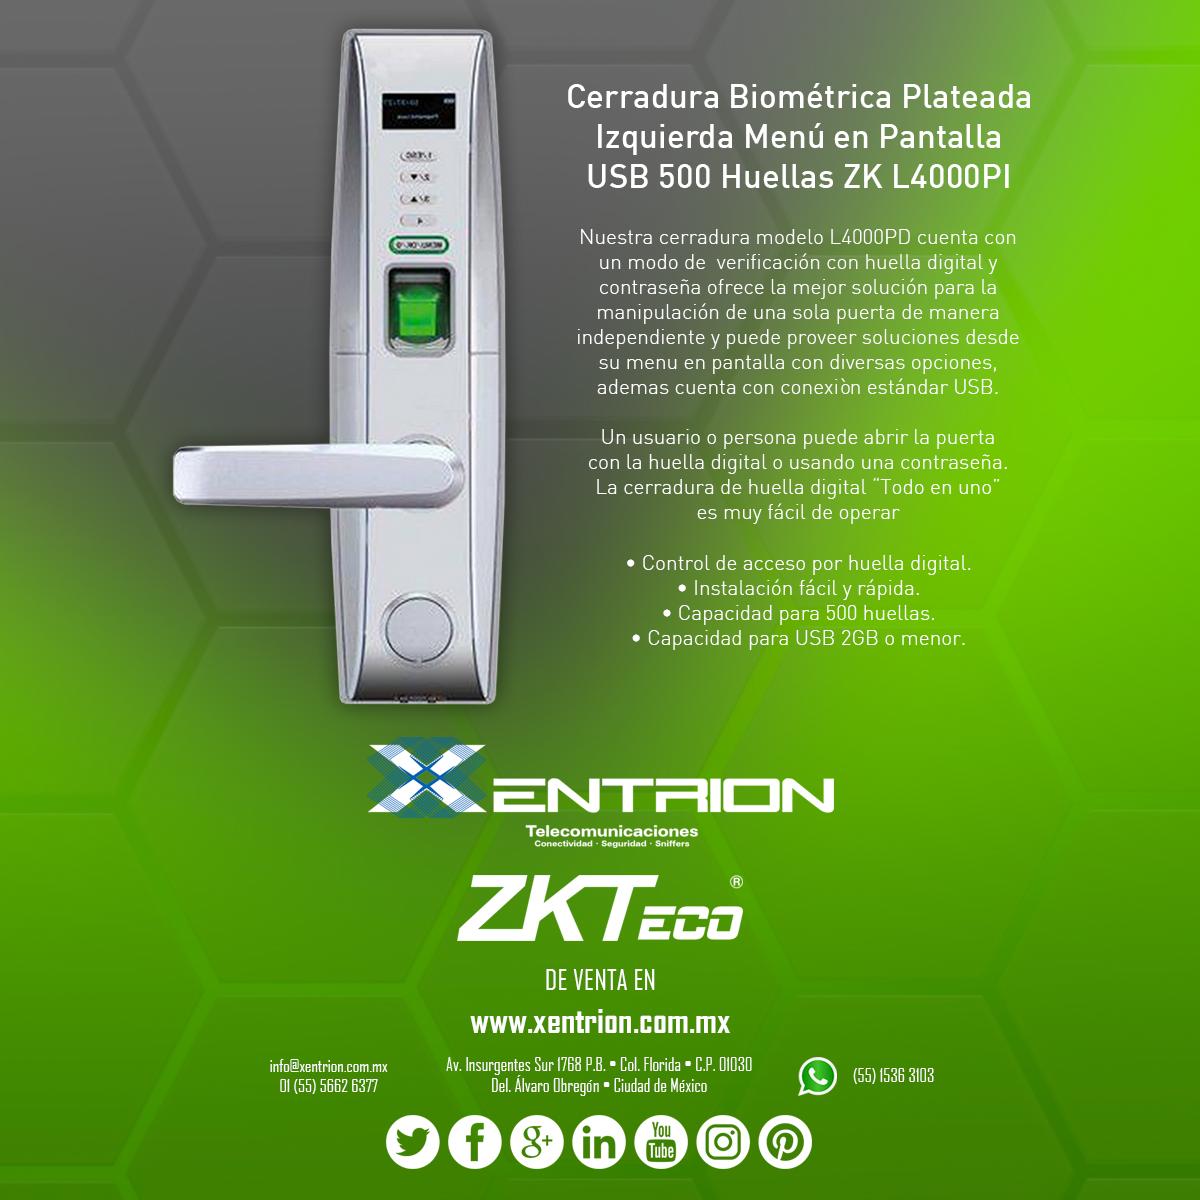 Cerradura Biométrica Plateada ZKTeco Inc Izquierda Menu en